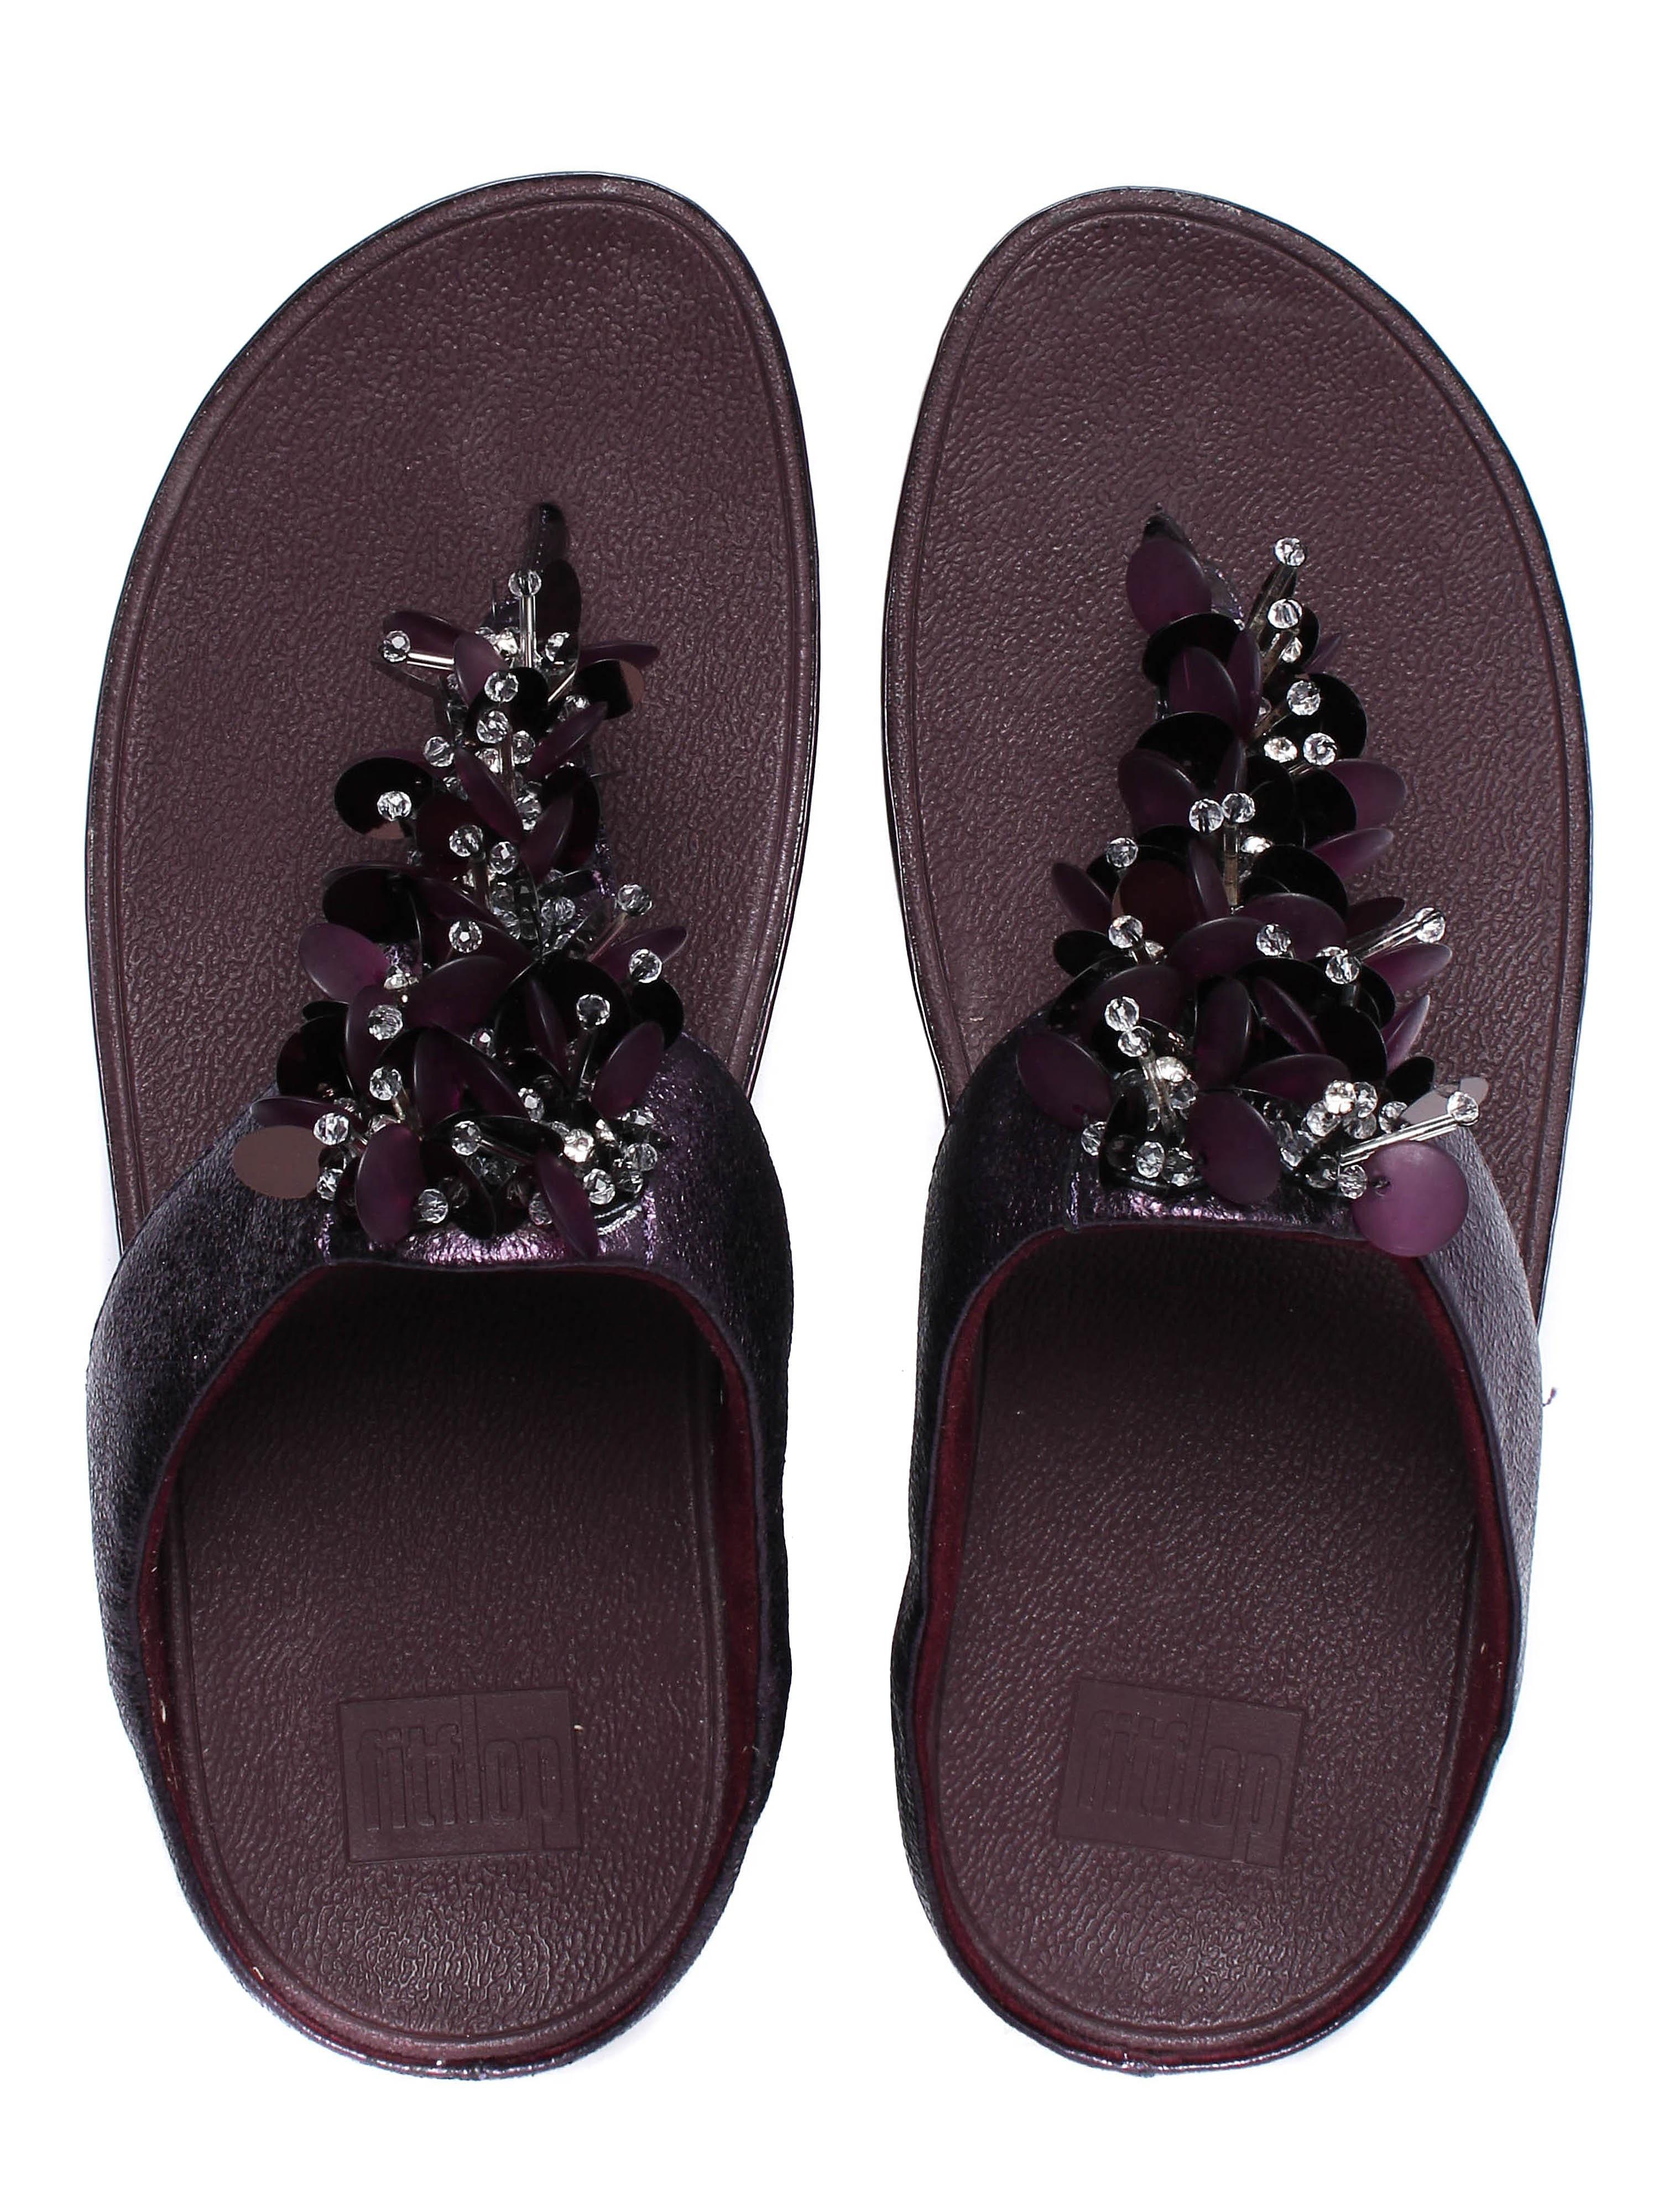 FitFlop Women's Boogaloo Toe-Post Sandals - Deep Plum